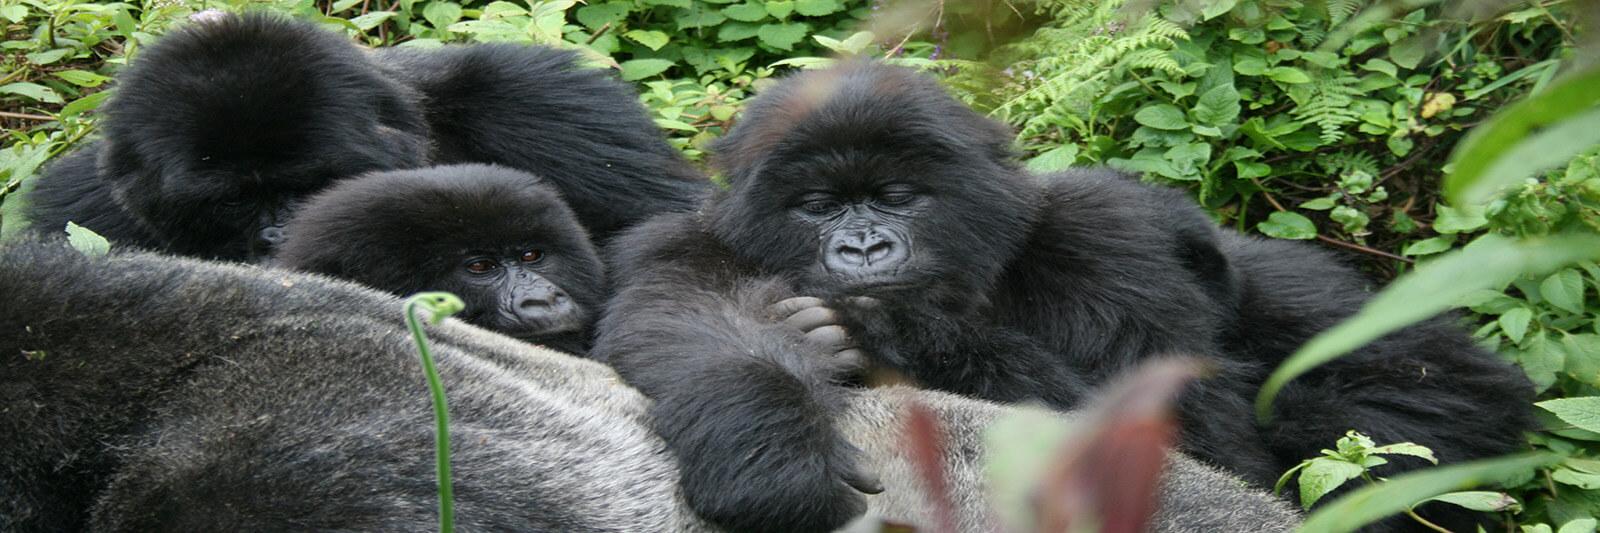 Mountain gorillas in northern Rwanda